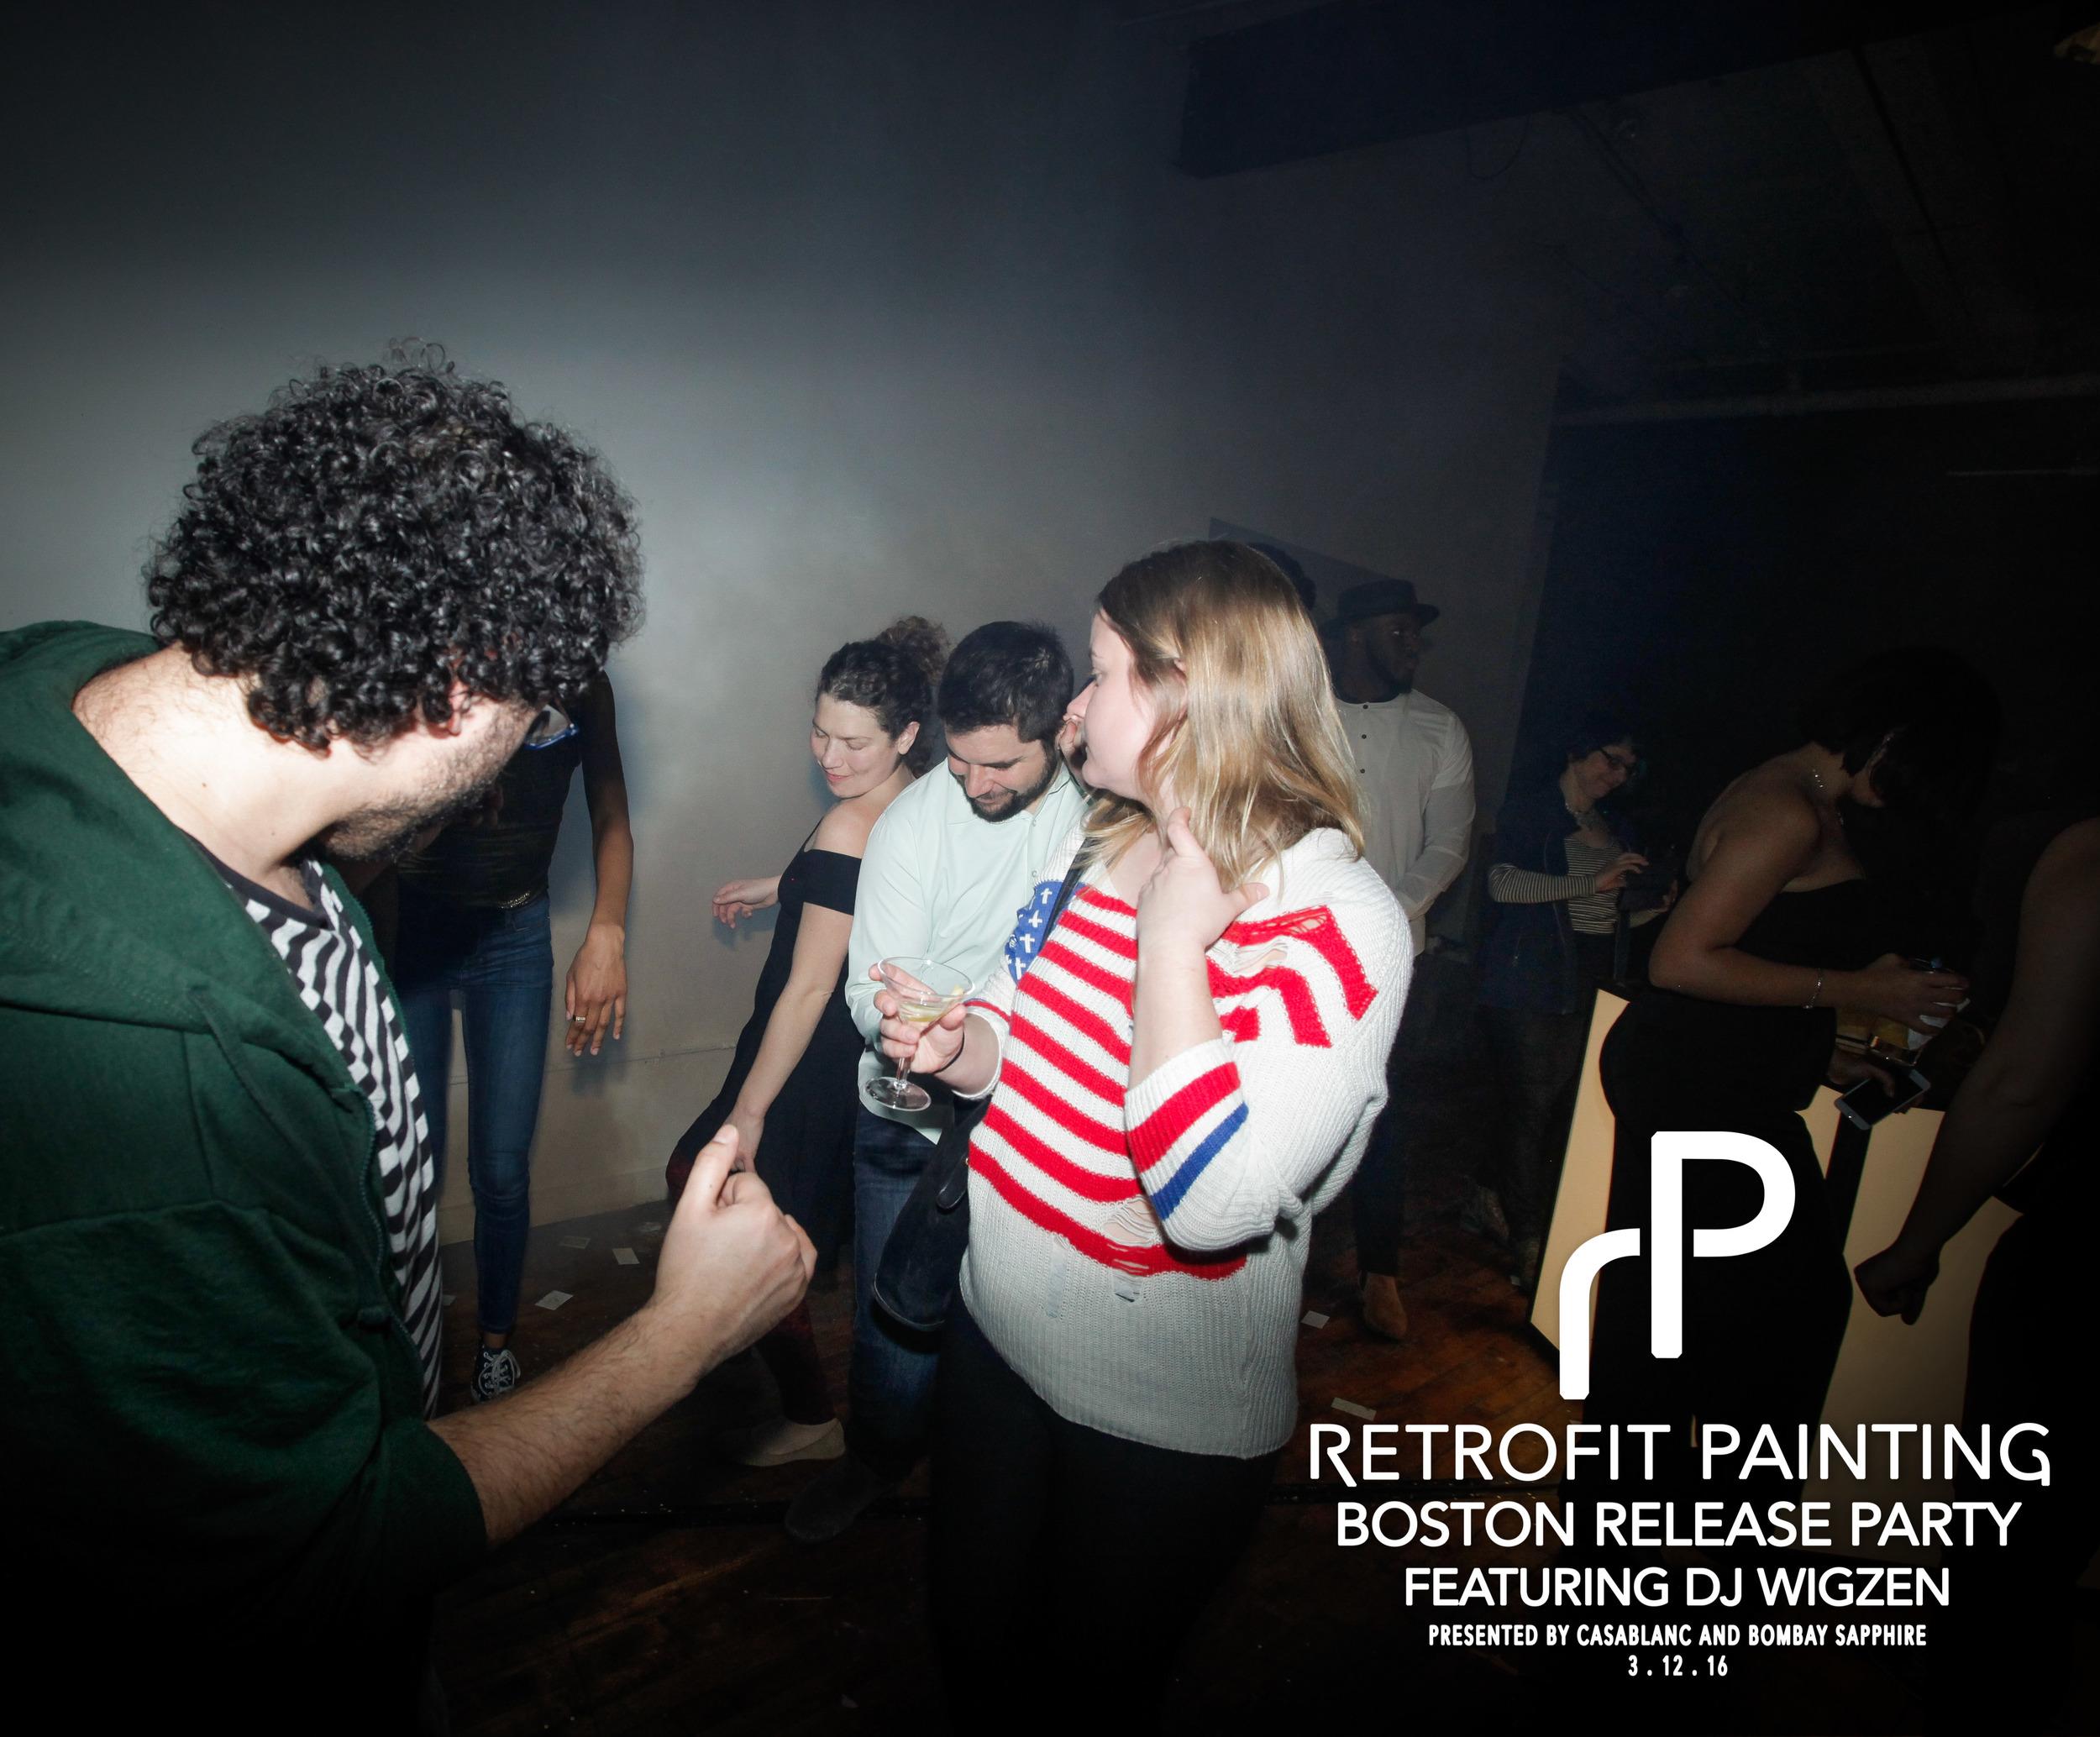 Retrofit Painting Boston Release Party 0157.jpg